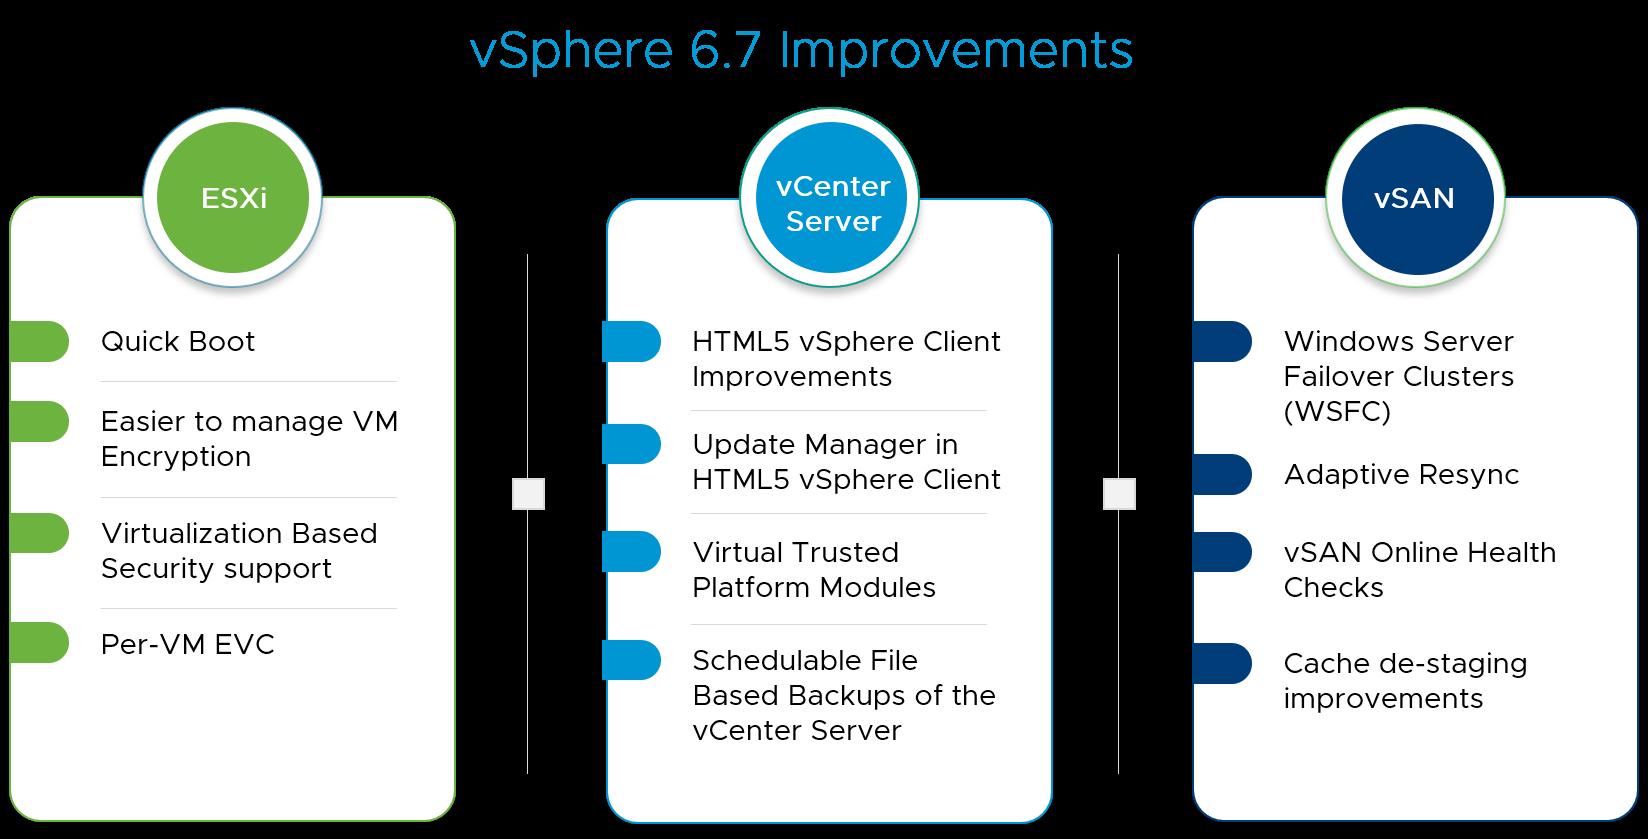 vsphere 6.7 improvements